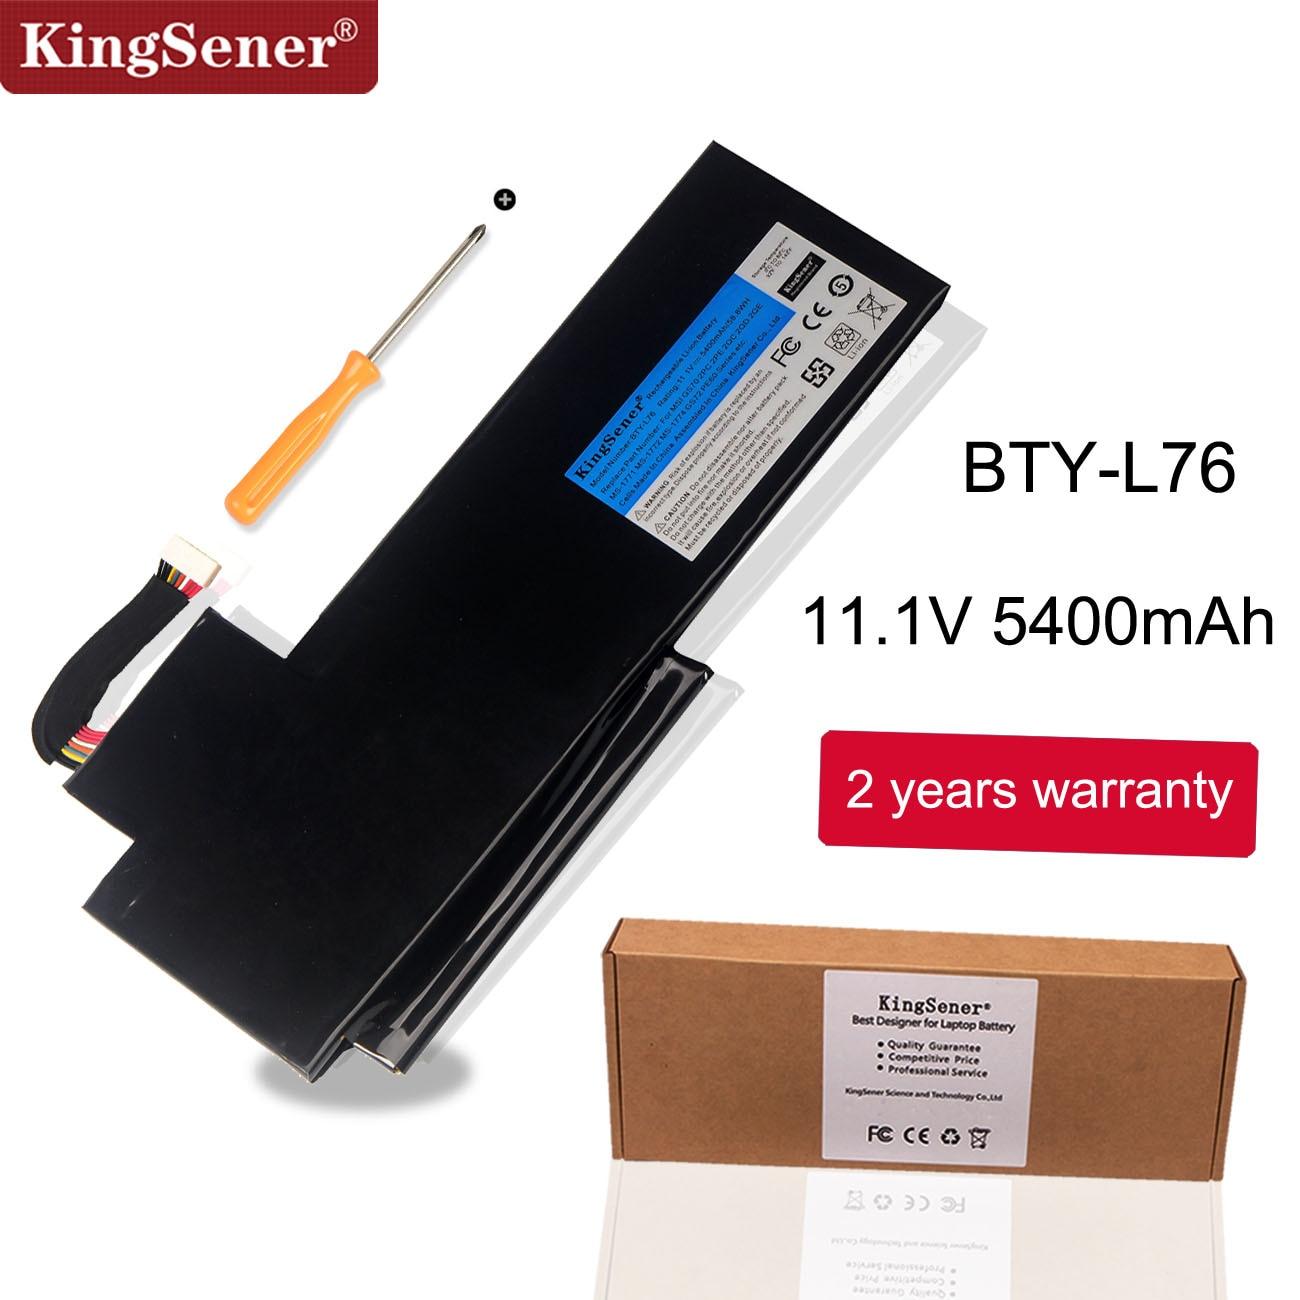 KingSener BTY-L76 Аккумулятор для ноутбука MSI GS70 2OD 2 шт. 2PE 2QC 2QD 2QE GS72 MS-1771 MS-1772 MS-1773 MEDION X7613 MD98802